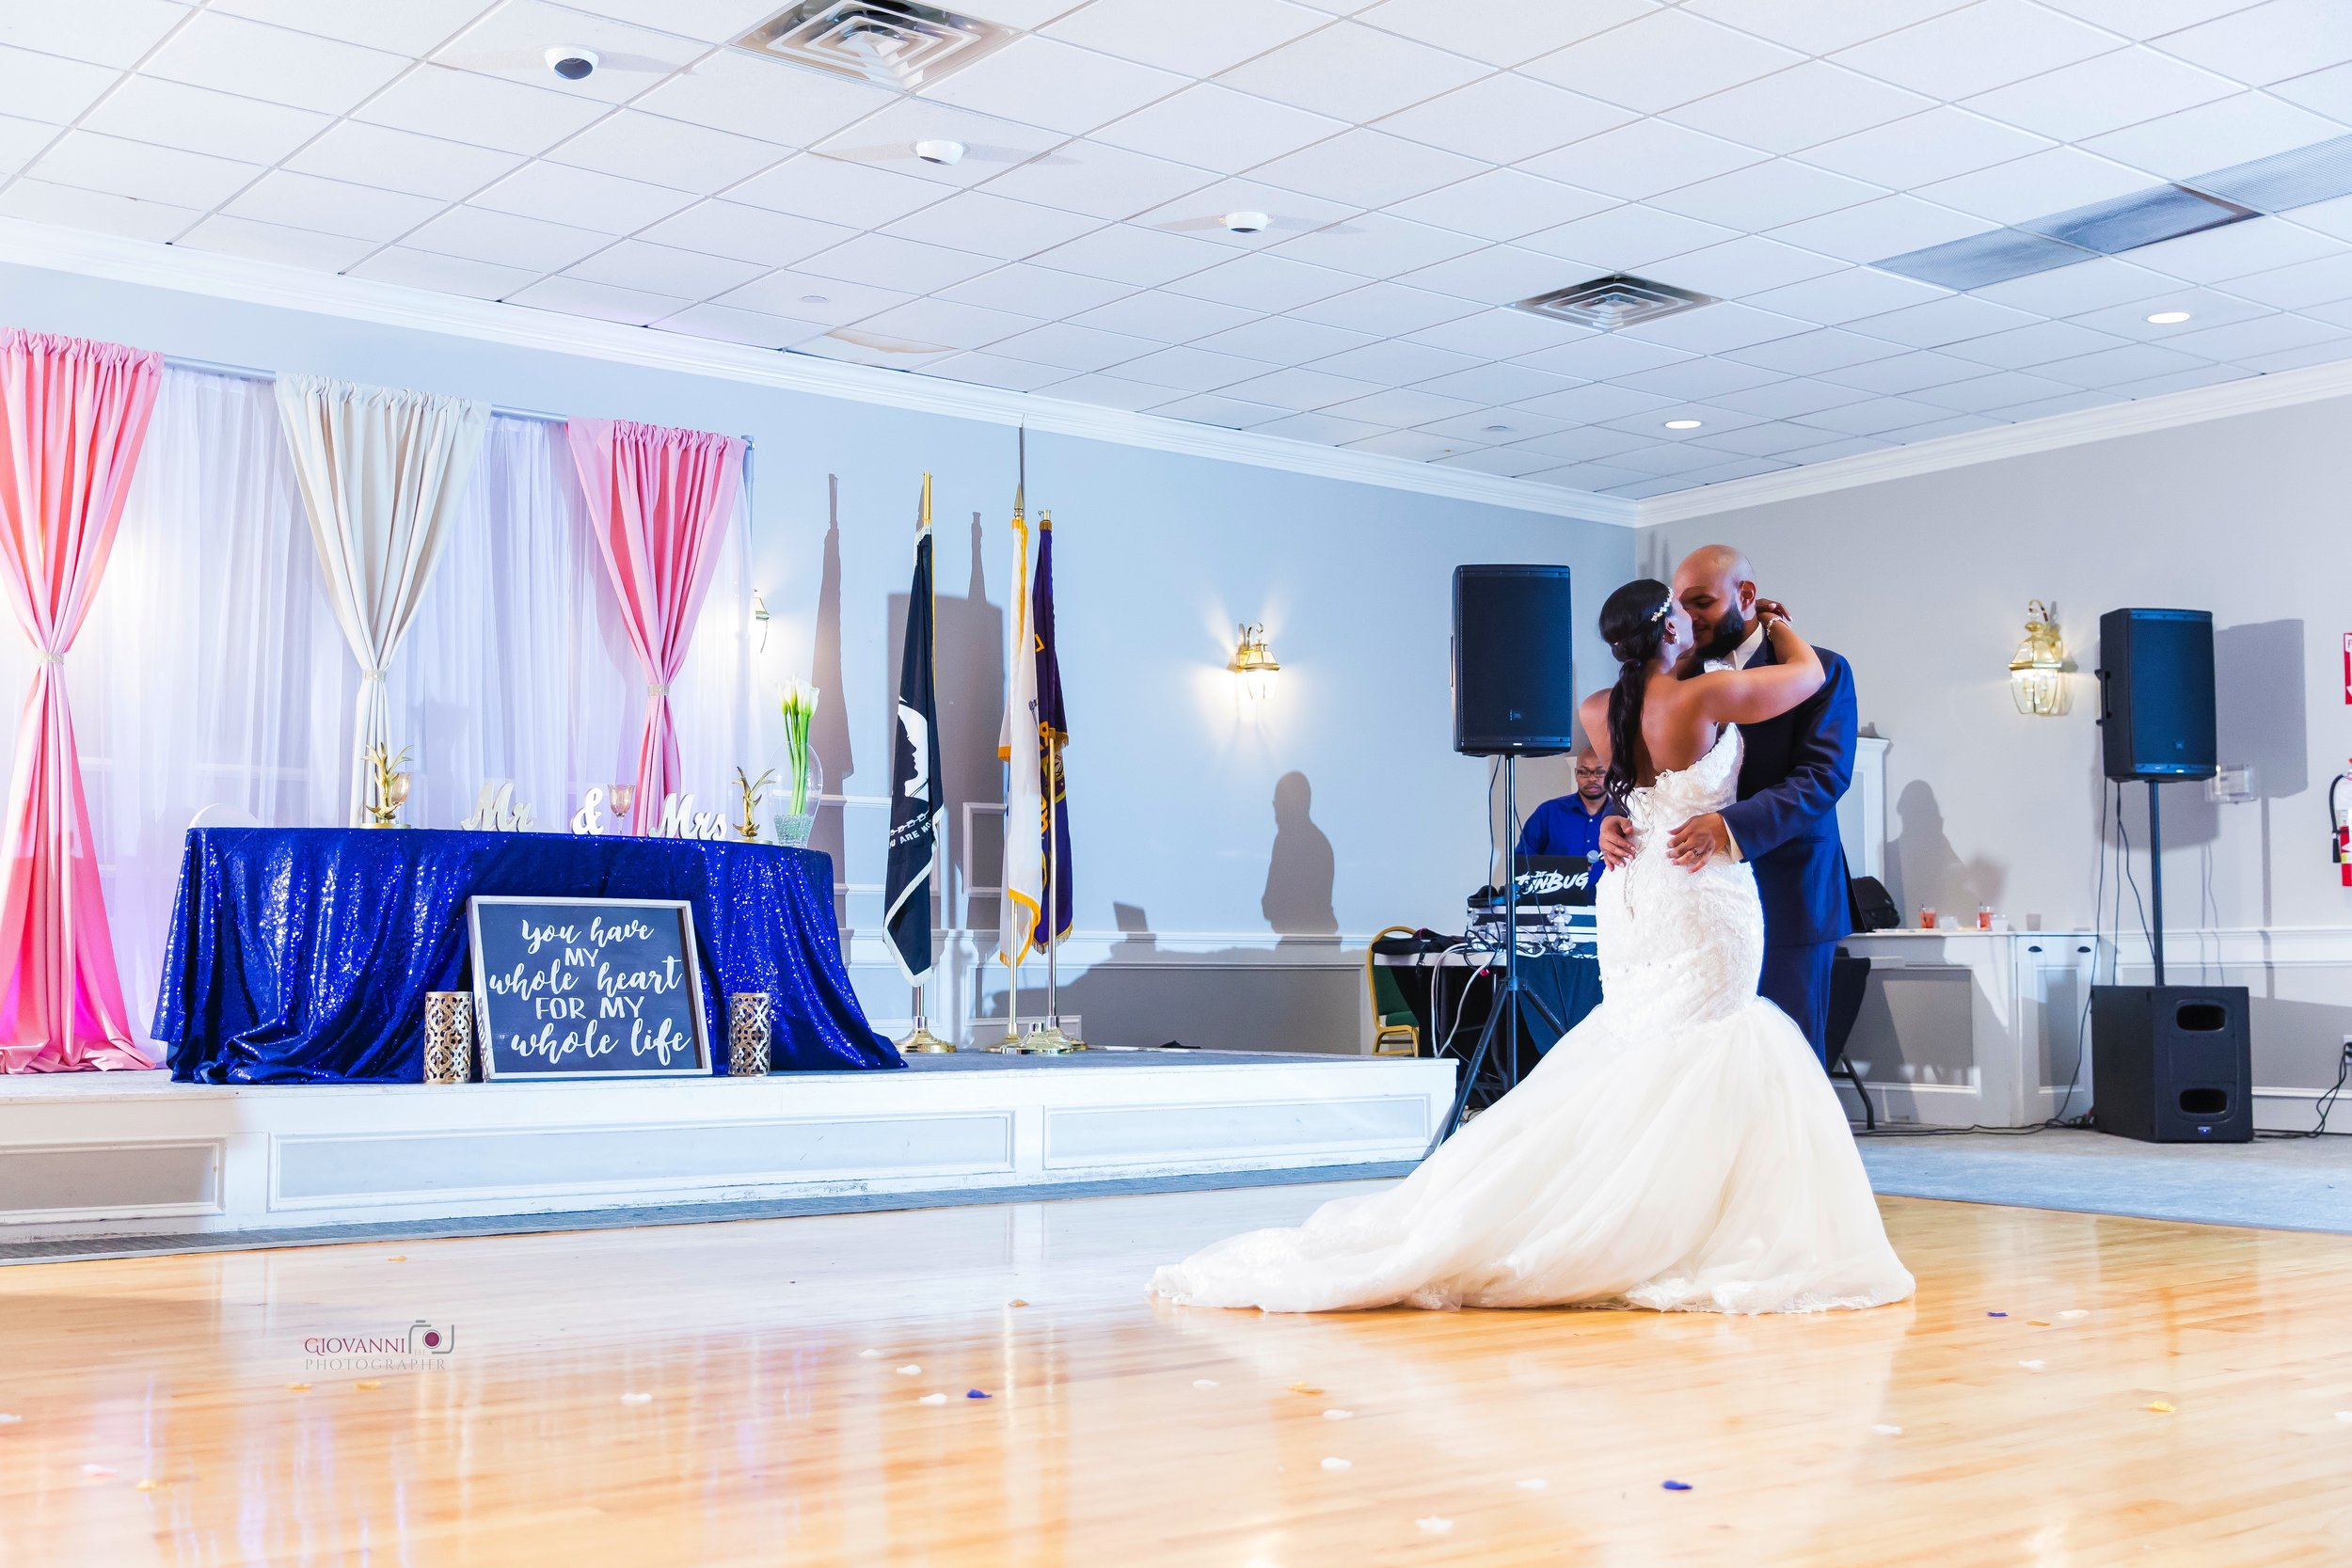 8C2A3811-Giovanni The Photographer-Best Boston Wedding Photography-Randolph Elks 2130 WM50.jpg